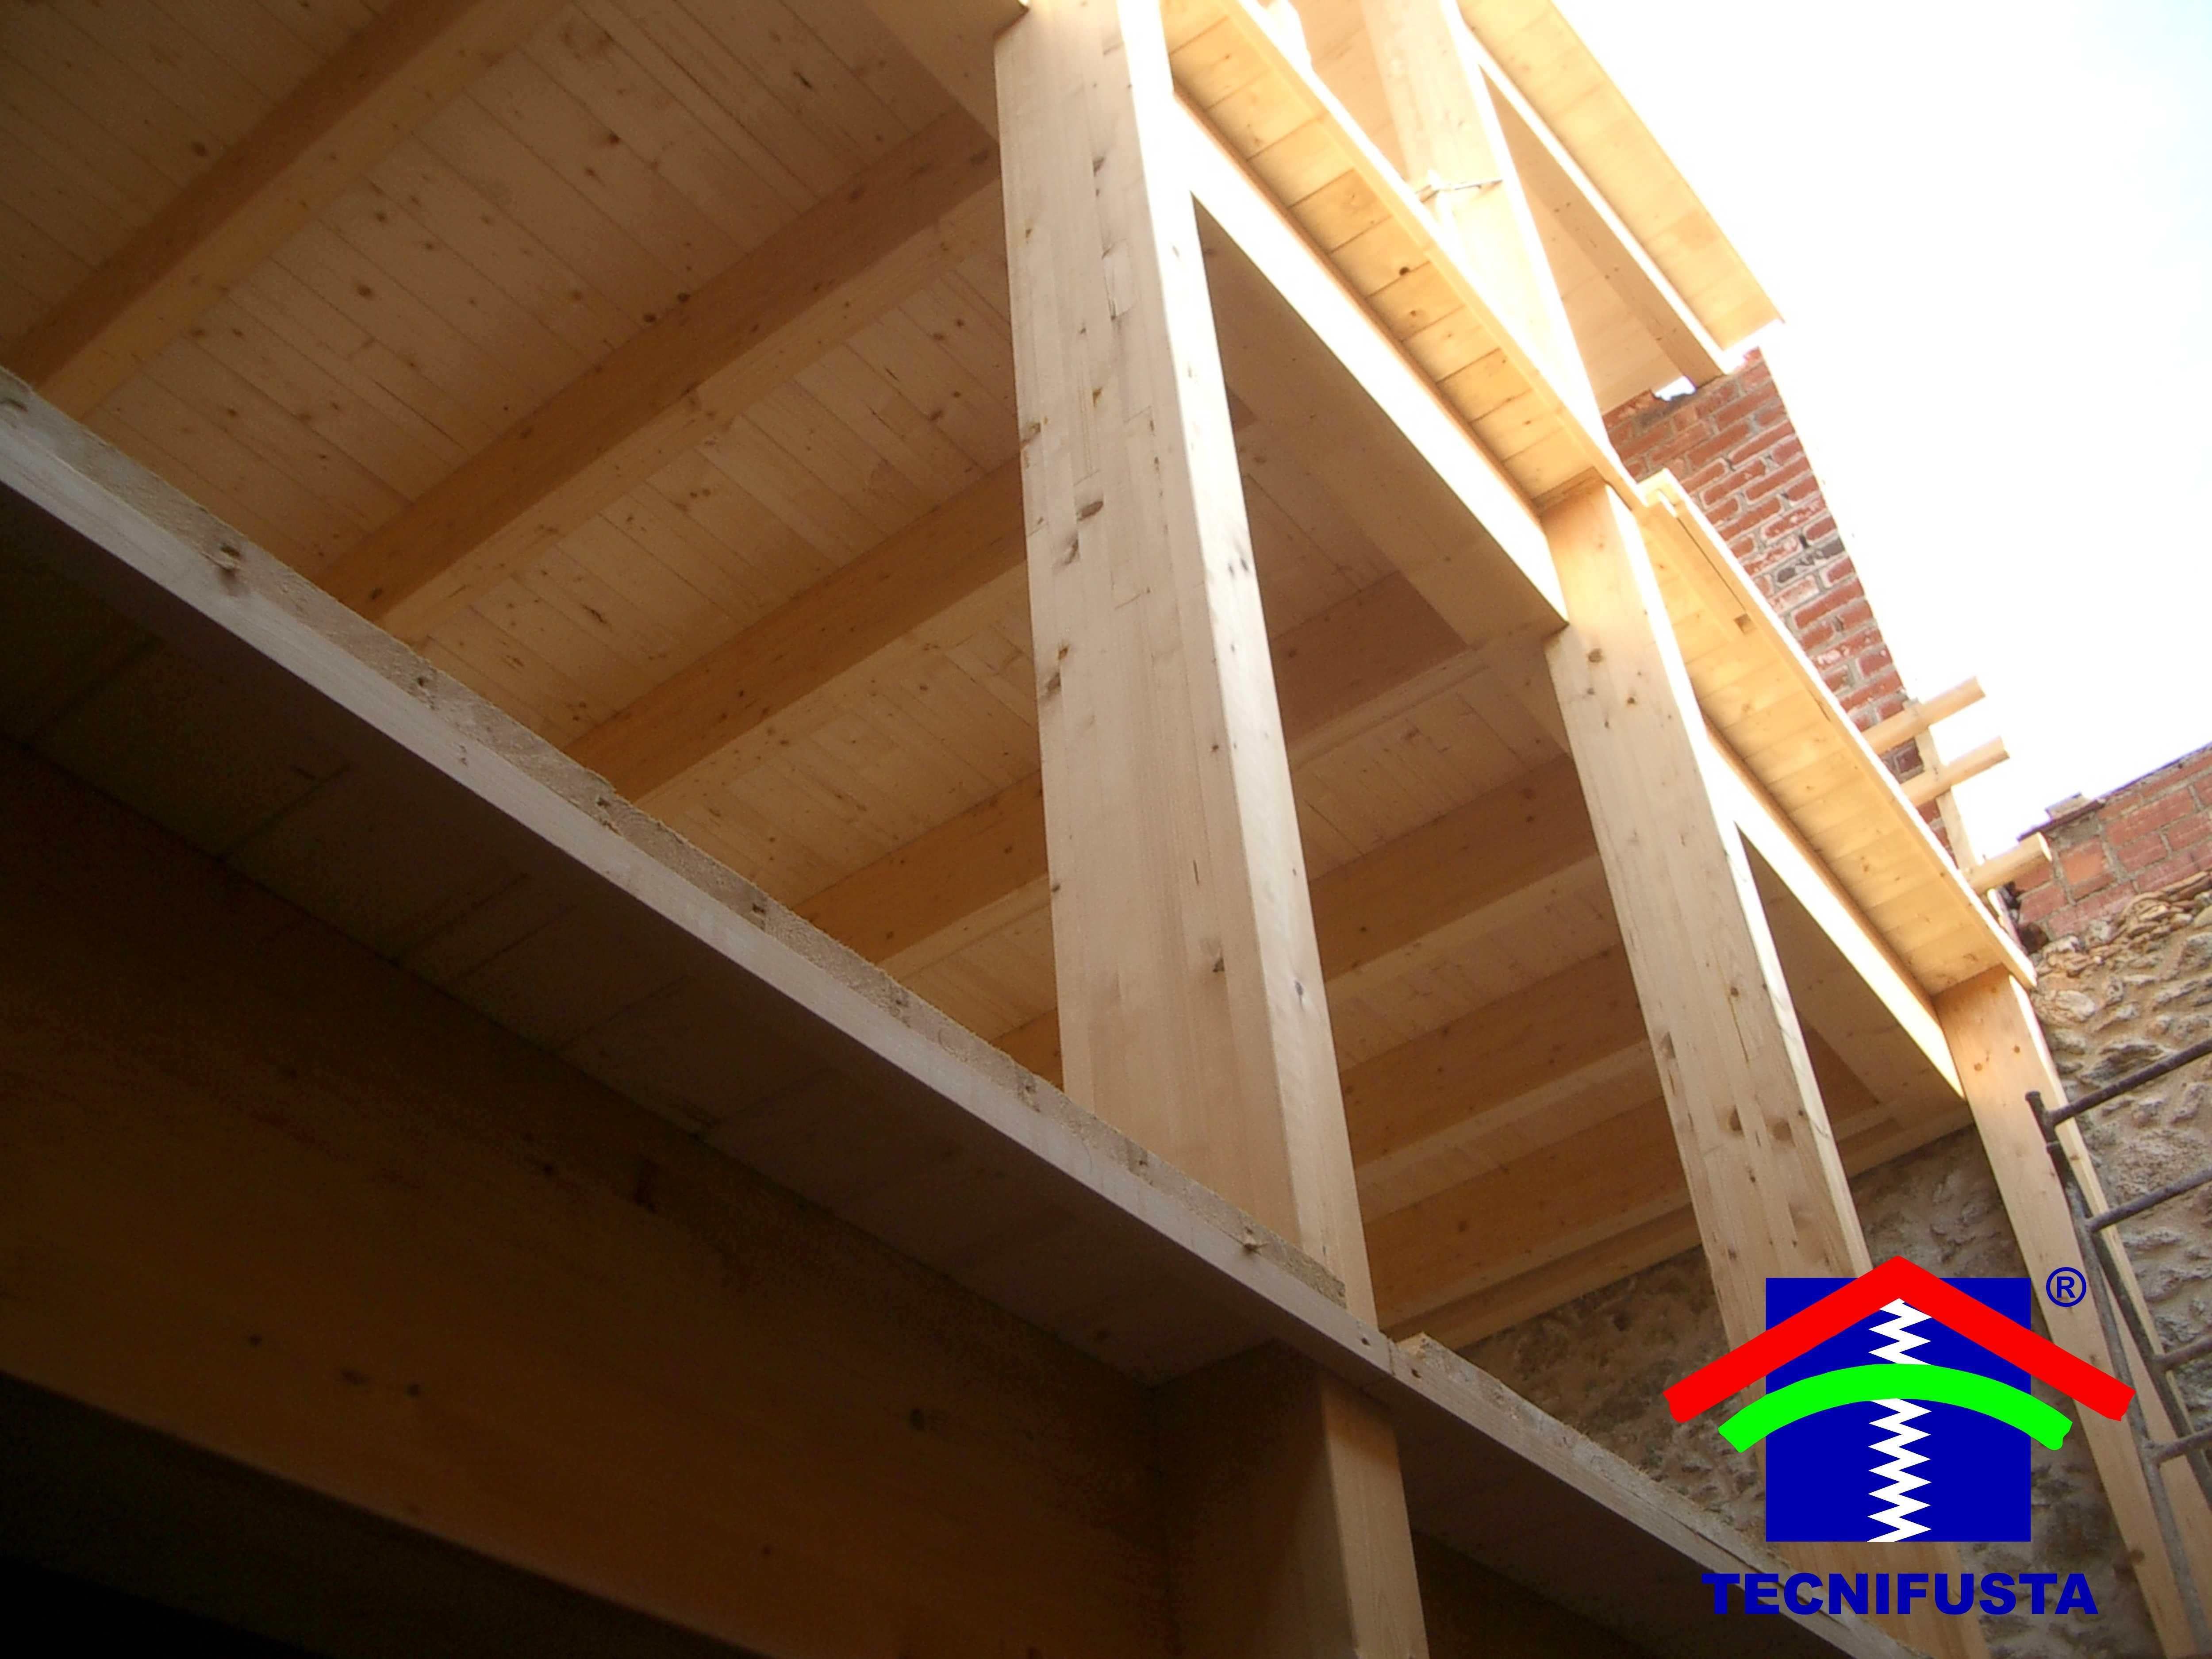 Estructuras de madera laminada tecnifusta - Estructuras de madera laminada ...